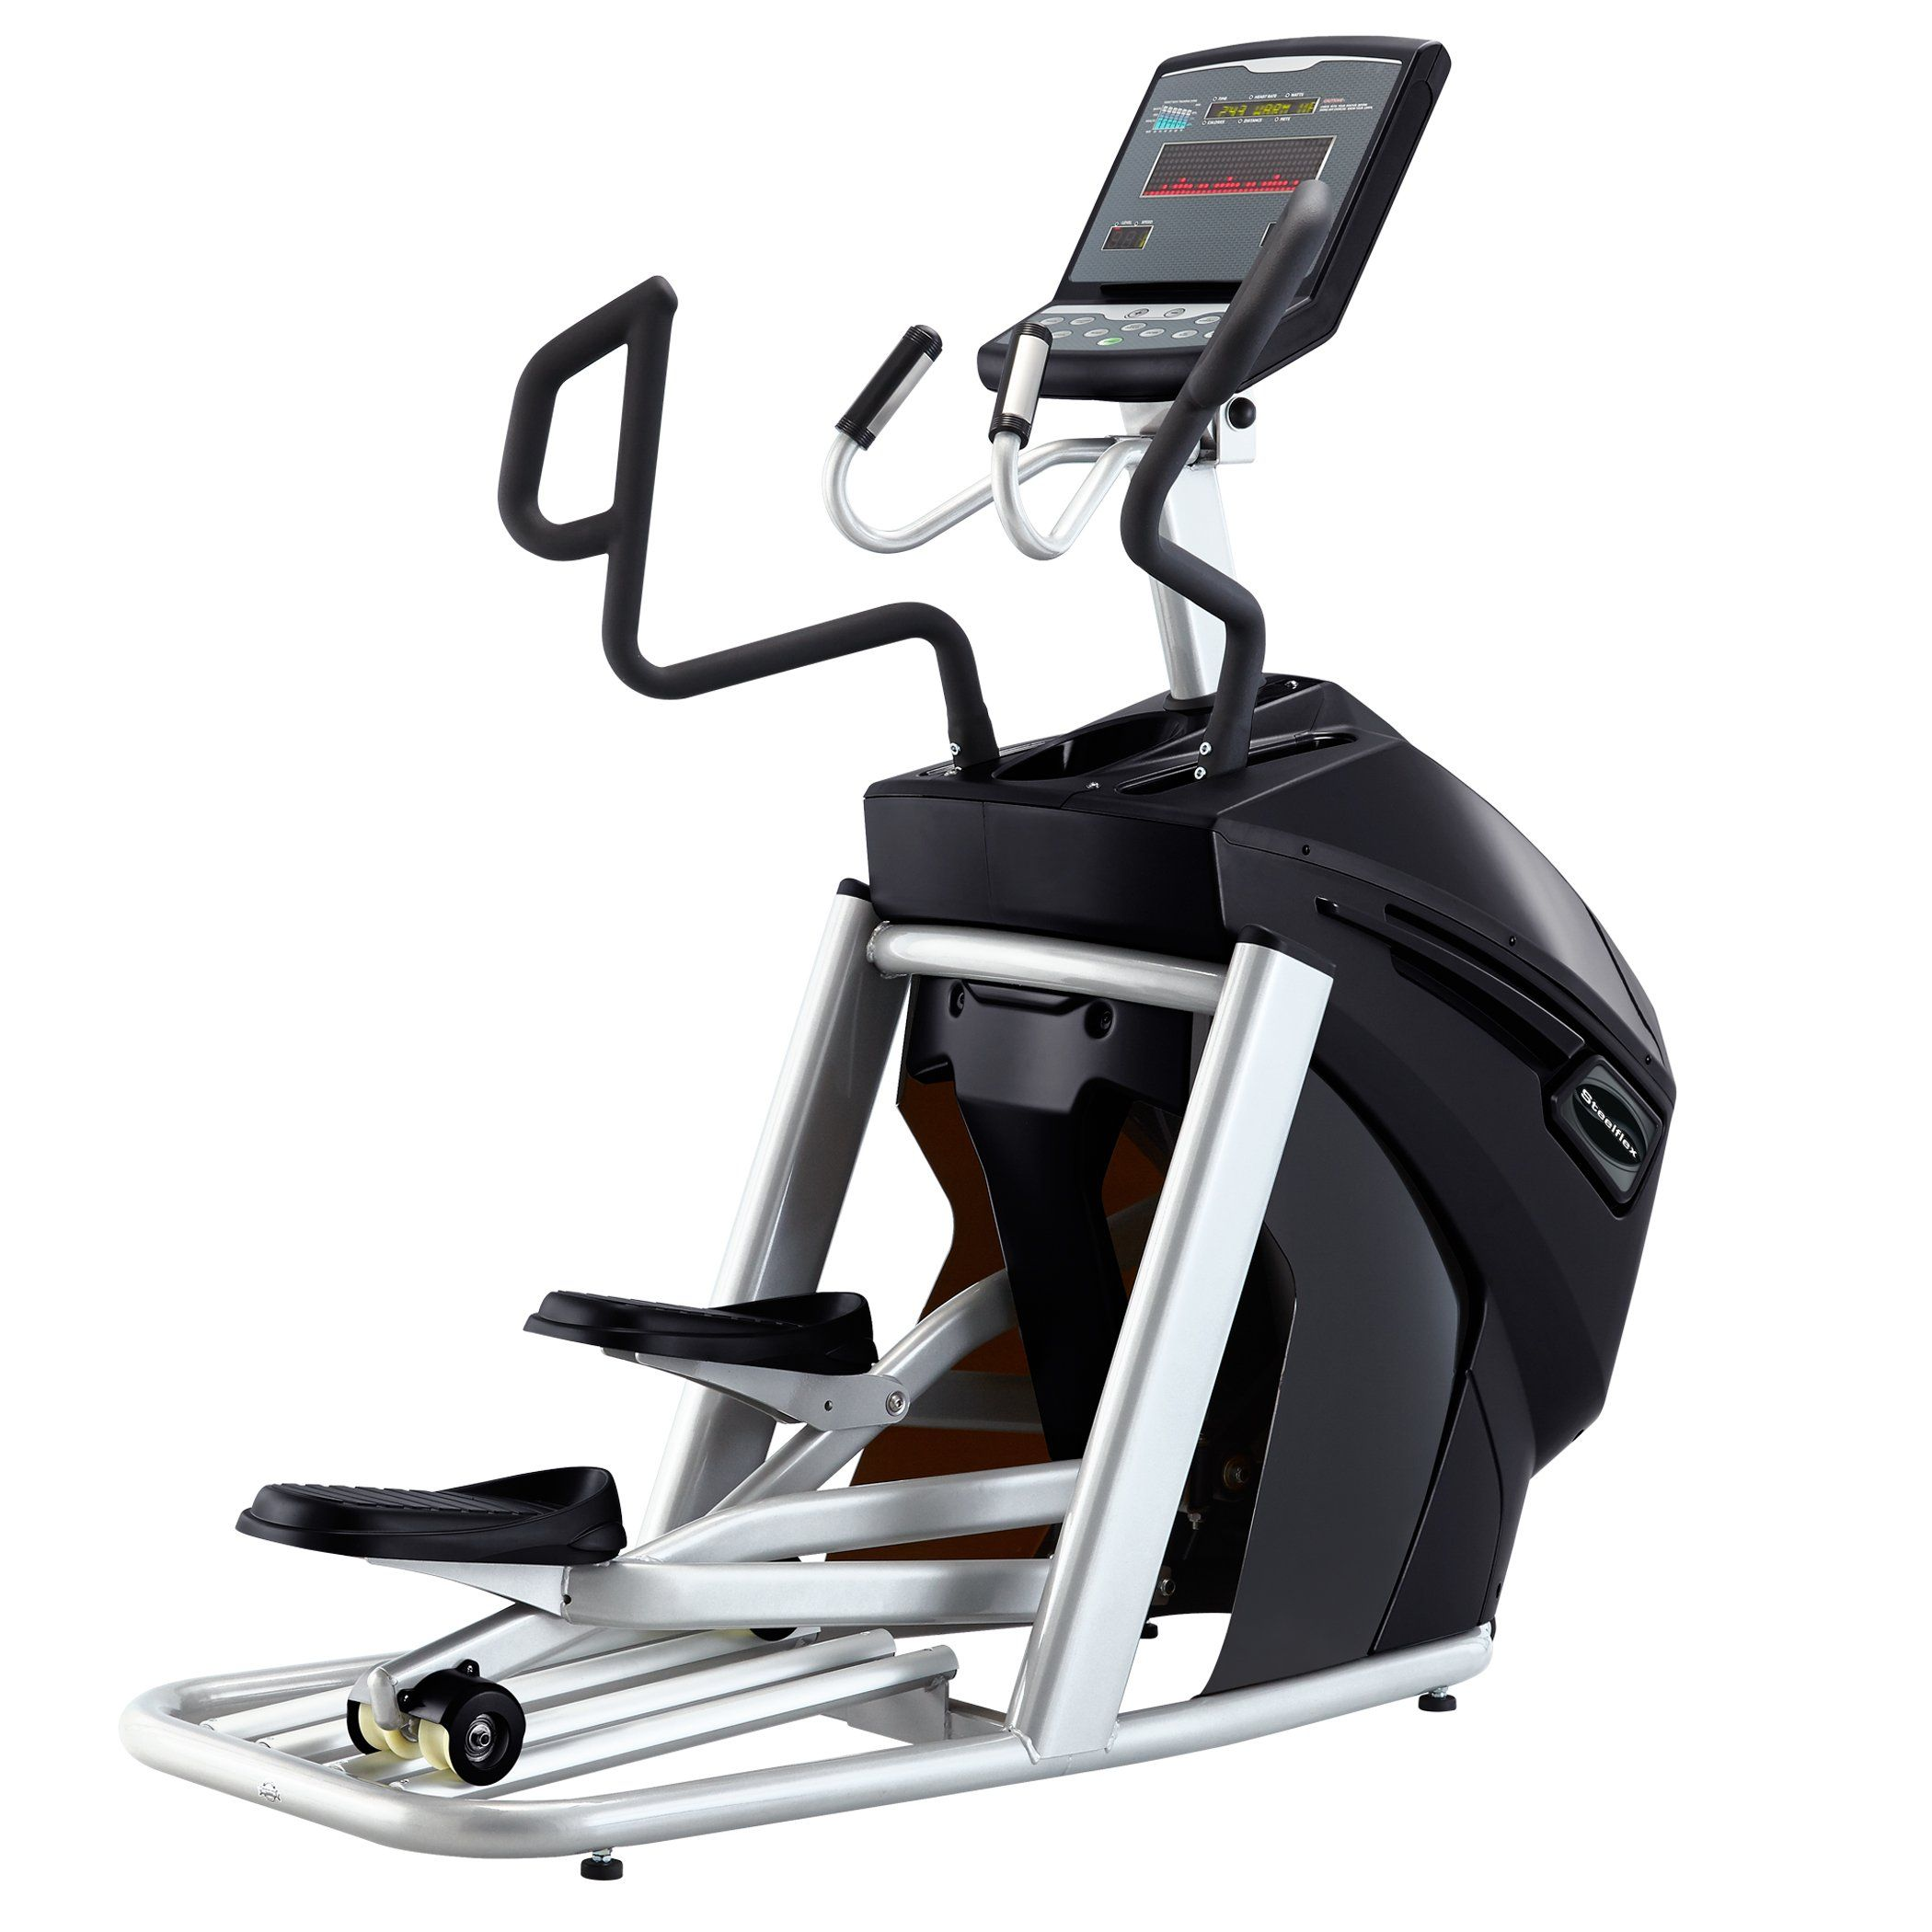 Cesg Elliptical Steelflex Cardio Workout Fitness Fitfam Health Gym Gymequipment Physicaleducationequipment Fi Elliptical No Equipment Workout Cardio